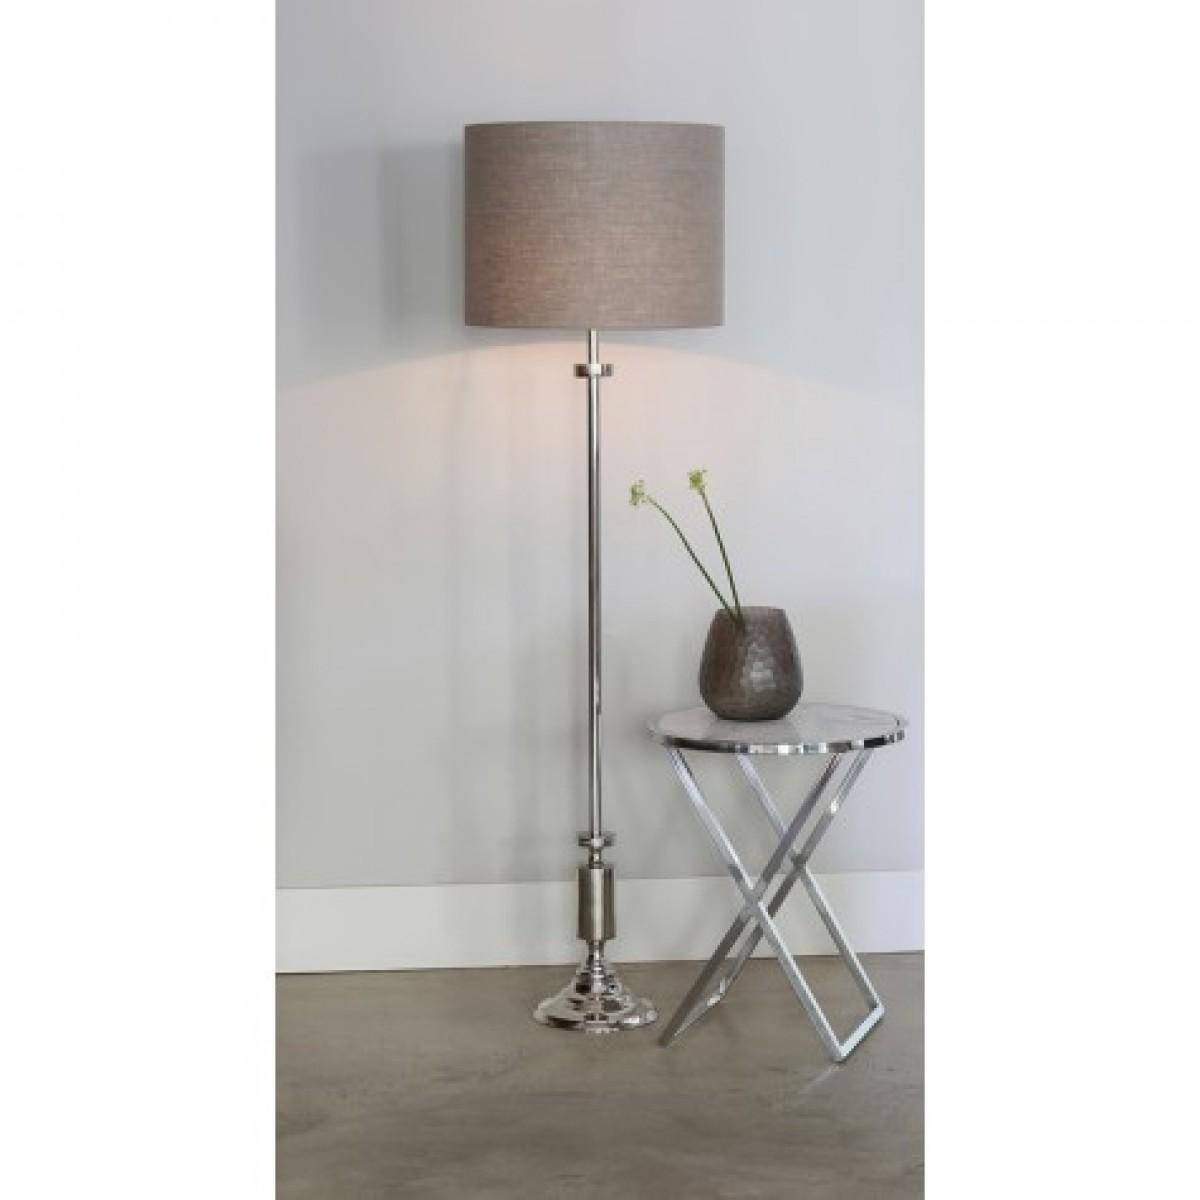 lampenfu silber f r stehlampe stehleuchte verchromt mit lampenschirm h he 140 190 cm. Black Bedroom Furniture Sets. Home Design Ideas